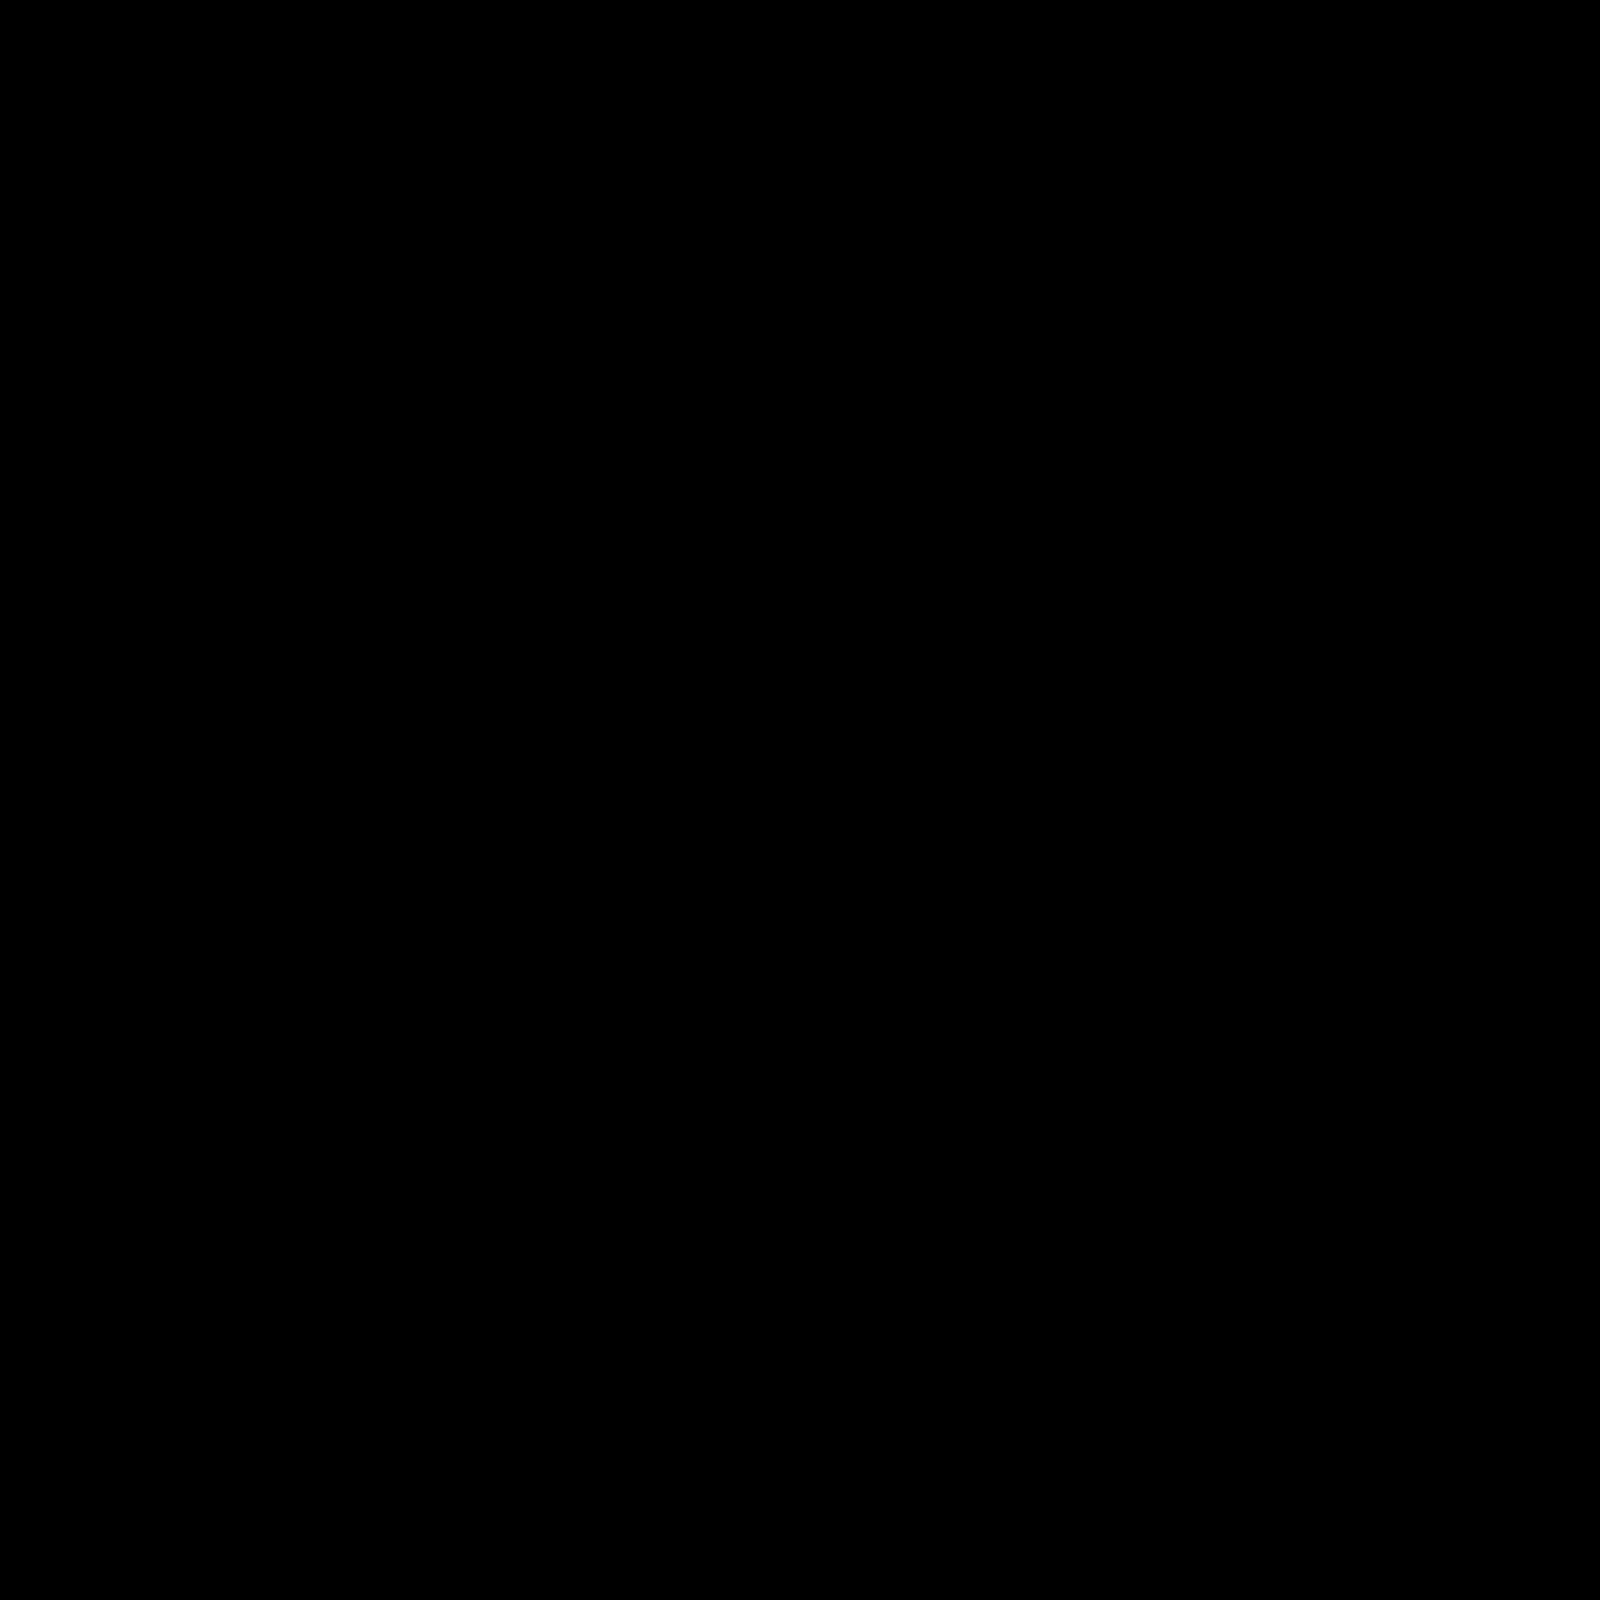 Rectangular icon